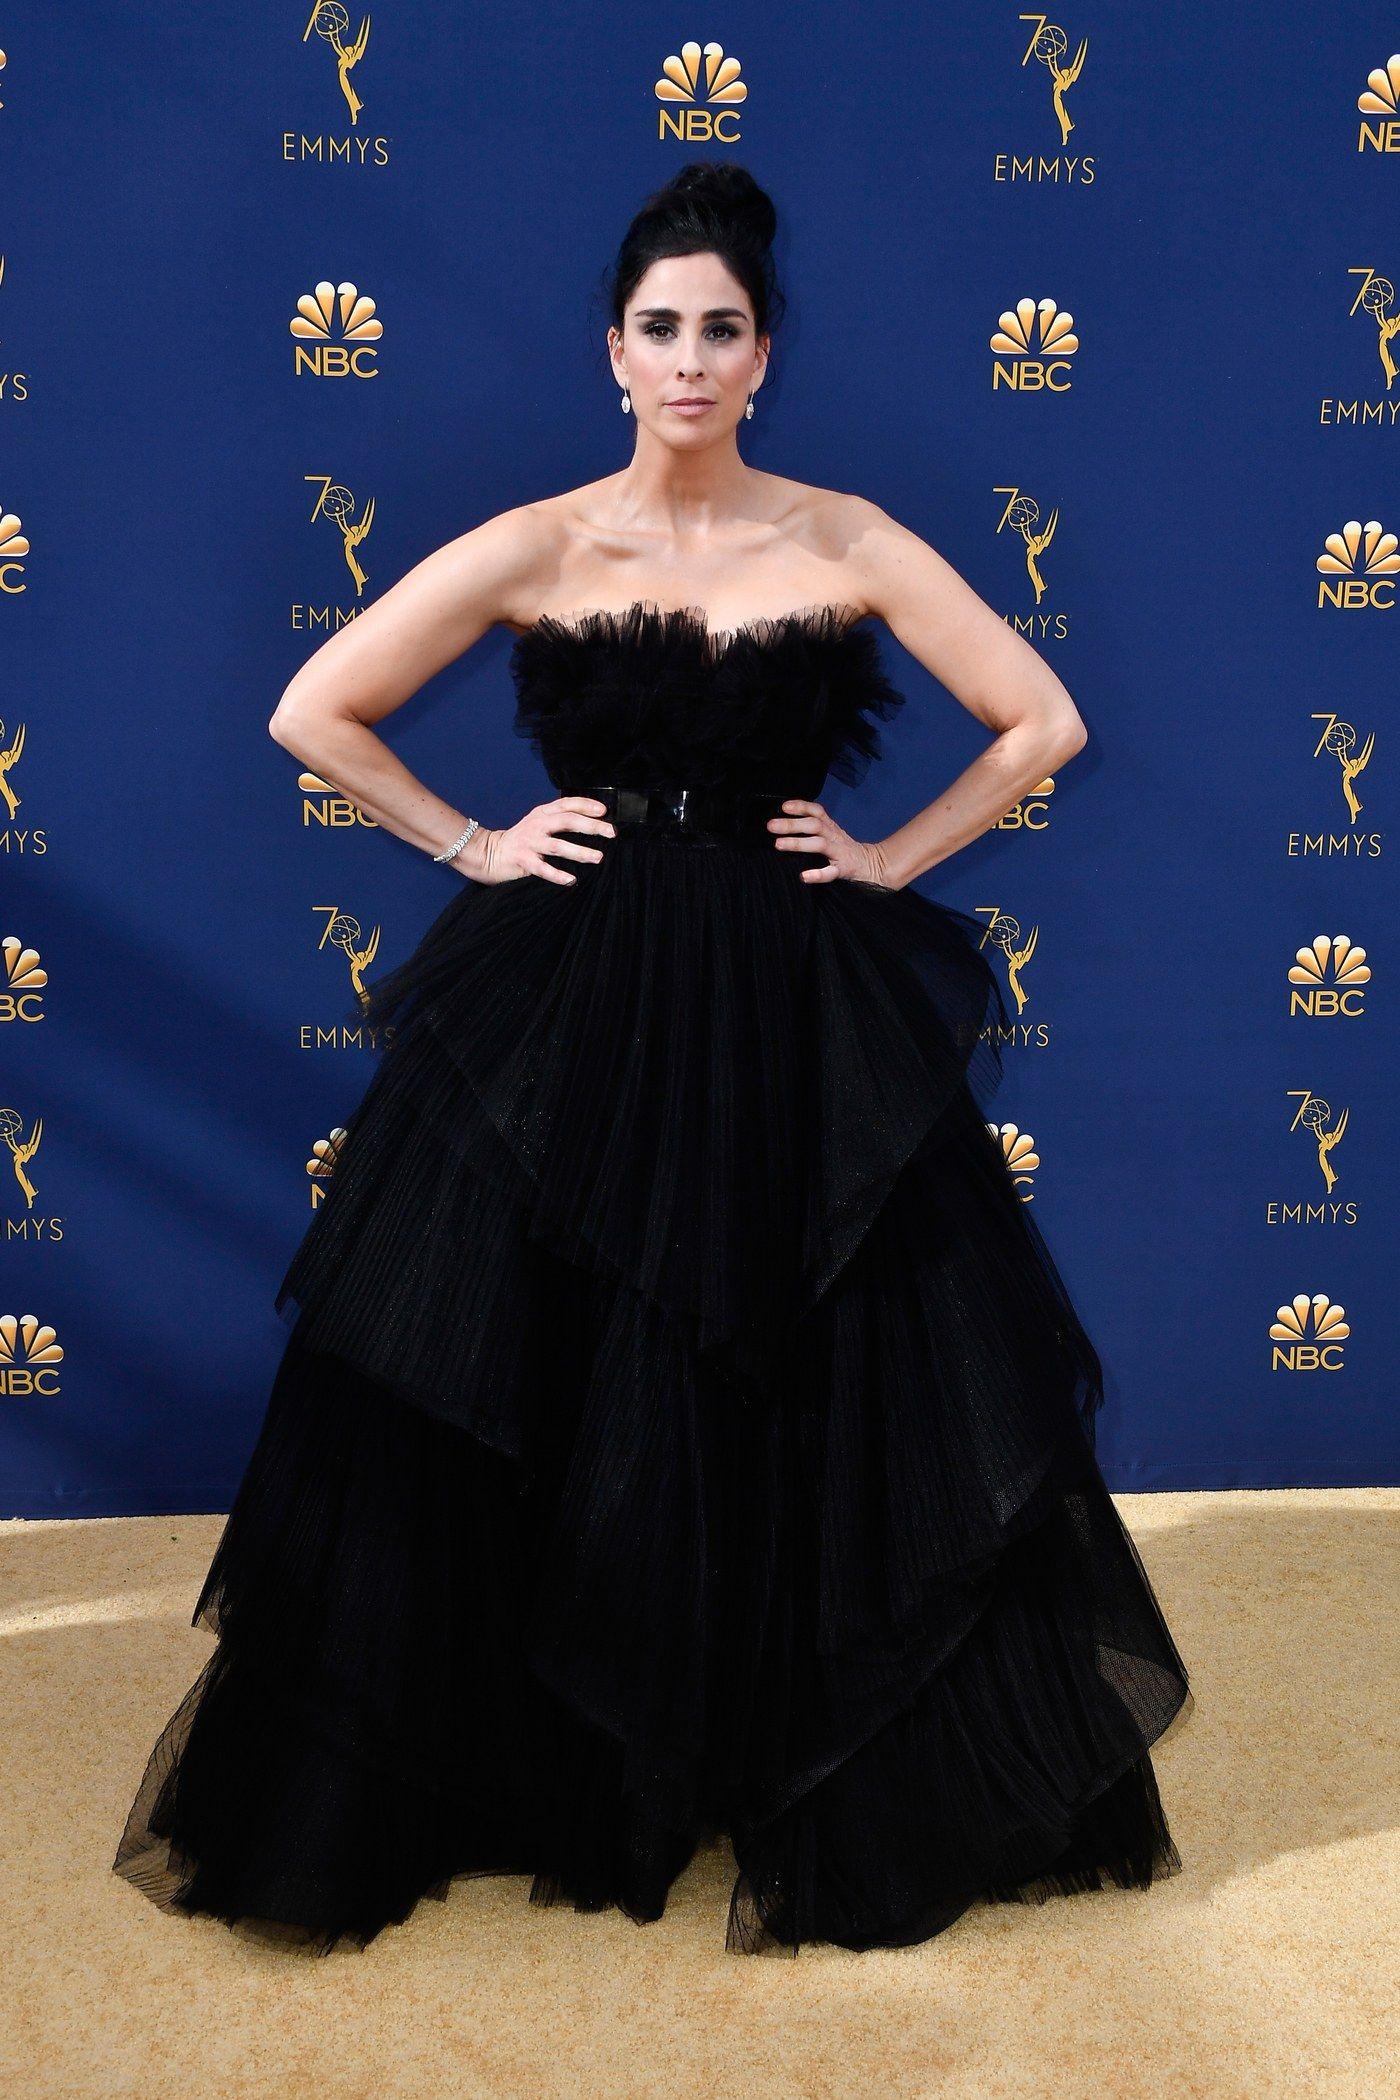 Best Supporting Actress Nominee Zazie Beetz Just Won Most